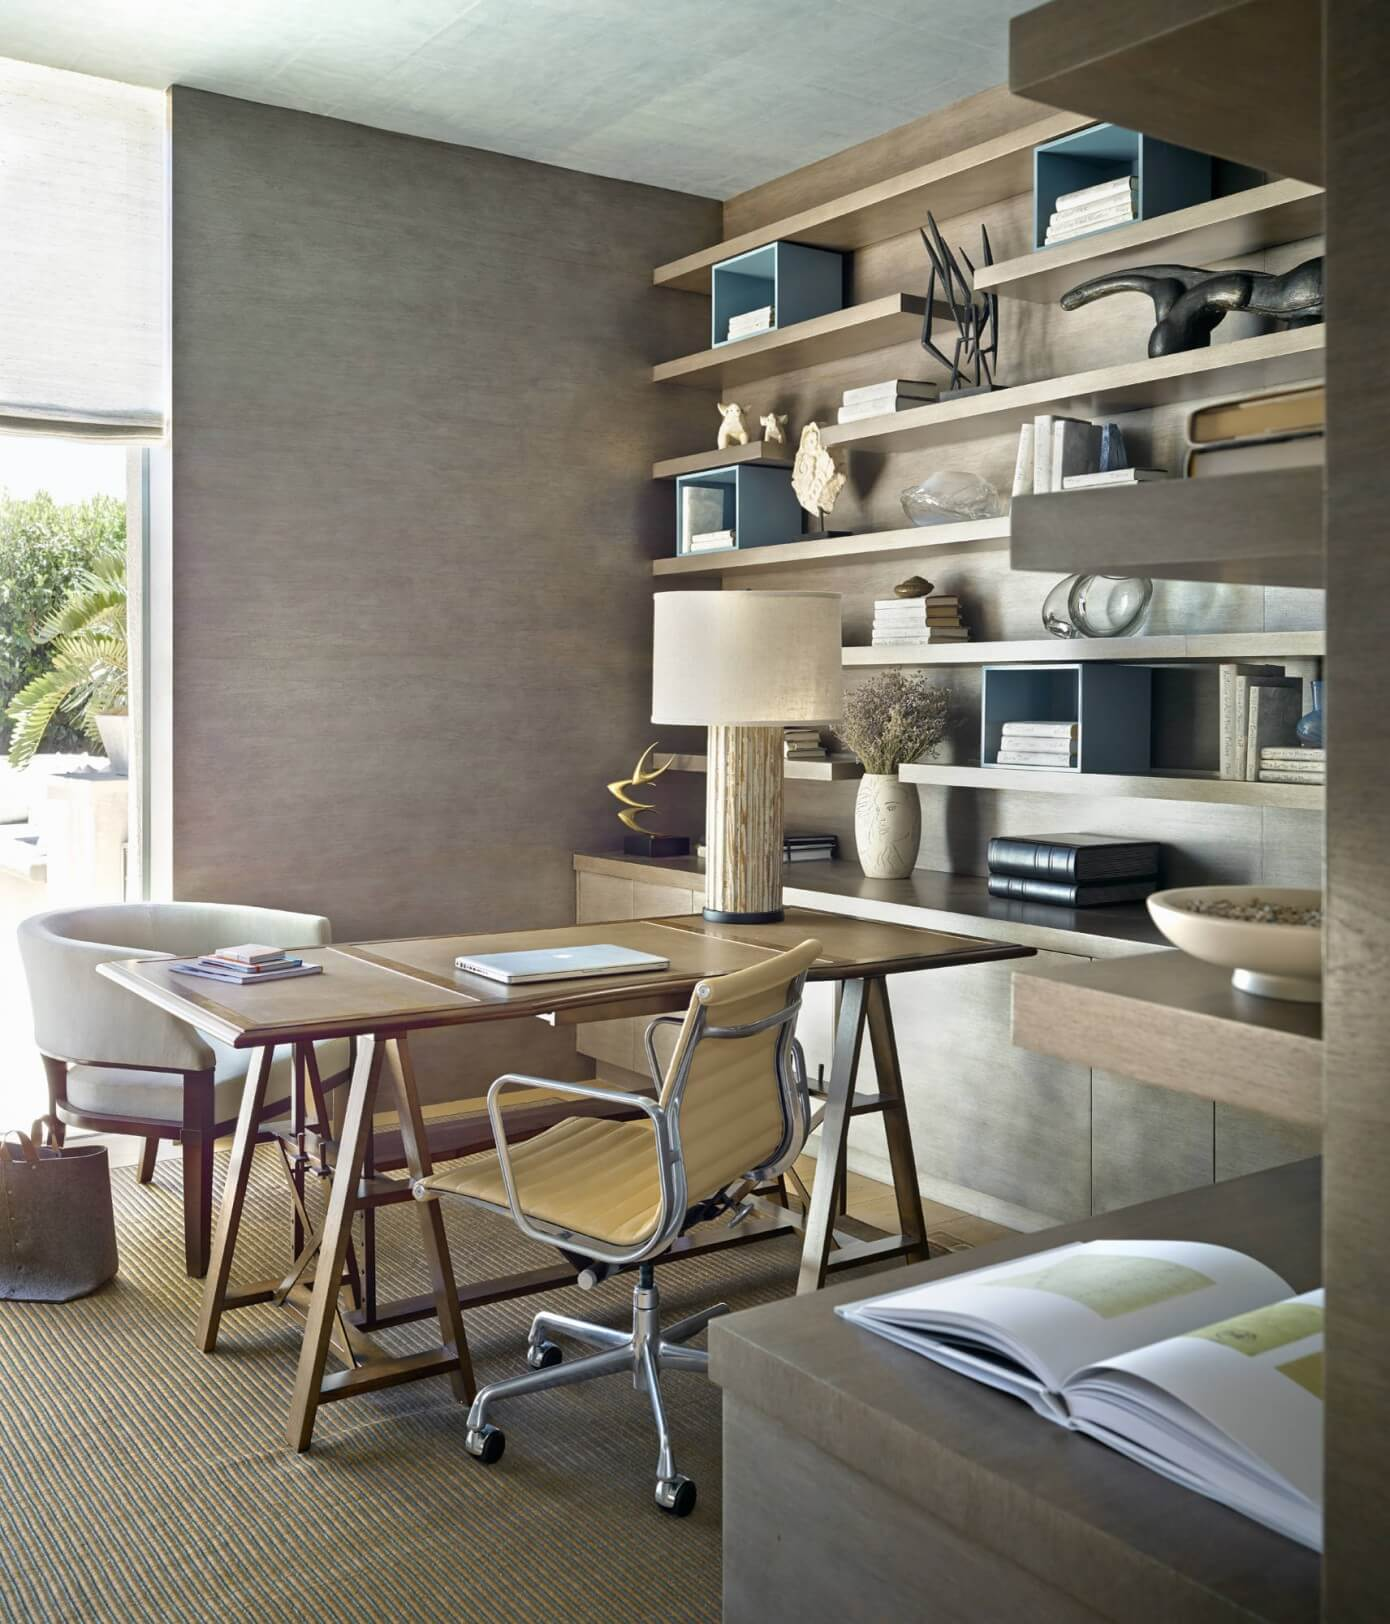 Coronado Residence by Island Architects